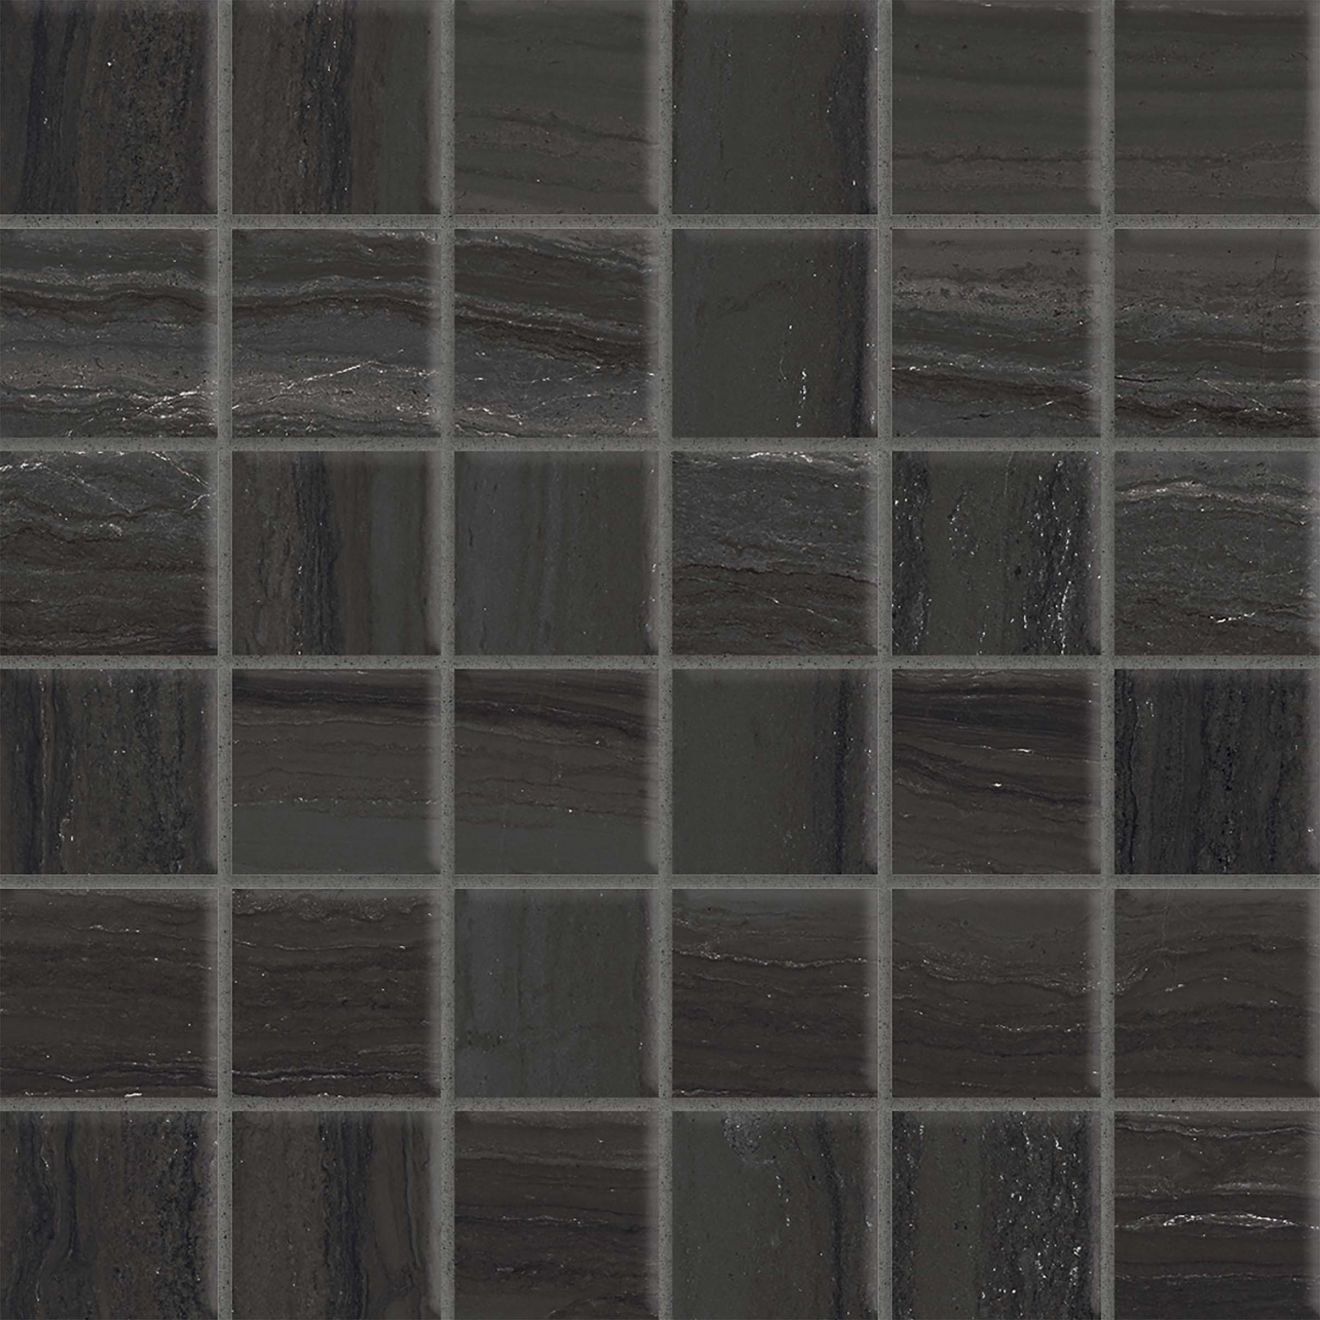 "Highland 2"" x 2"" Floor & Wall Mosaic in Black"